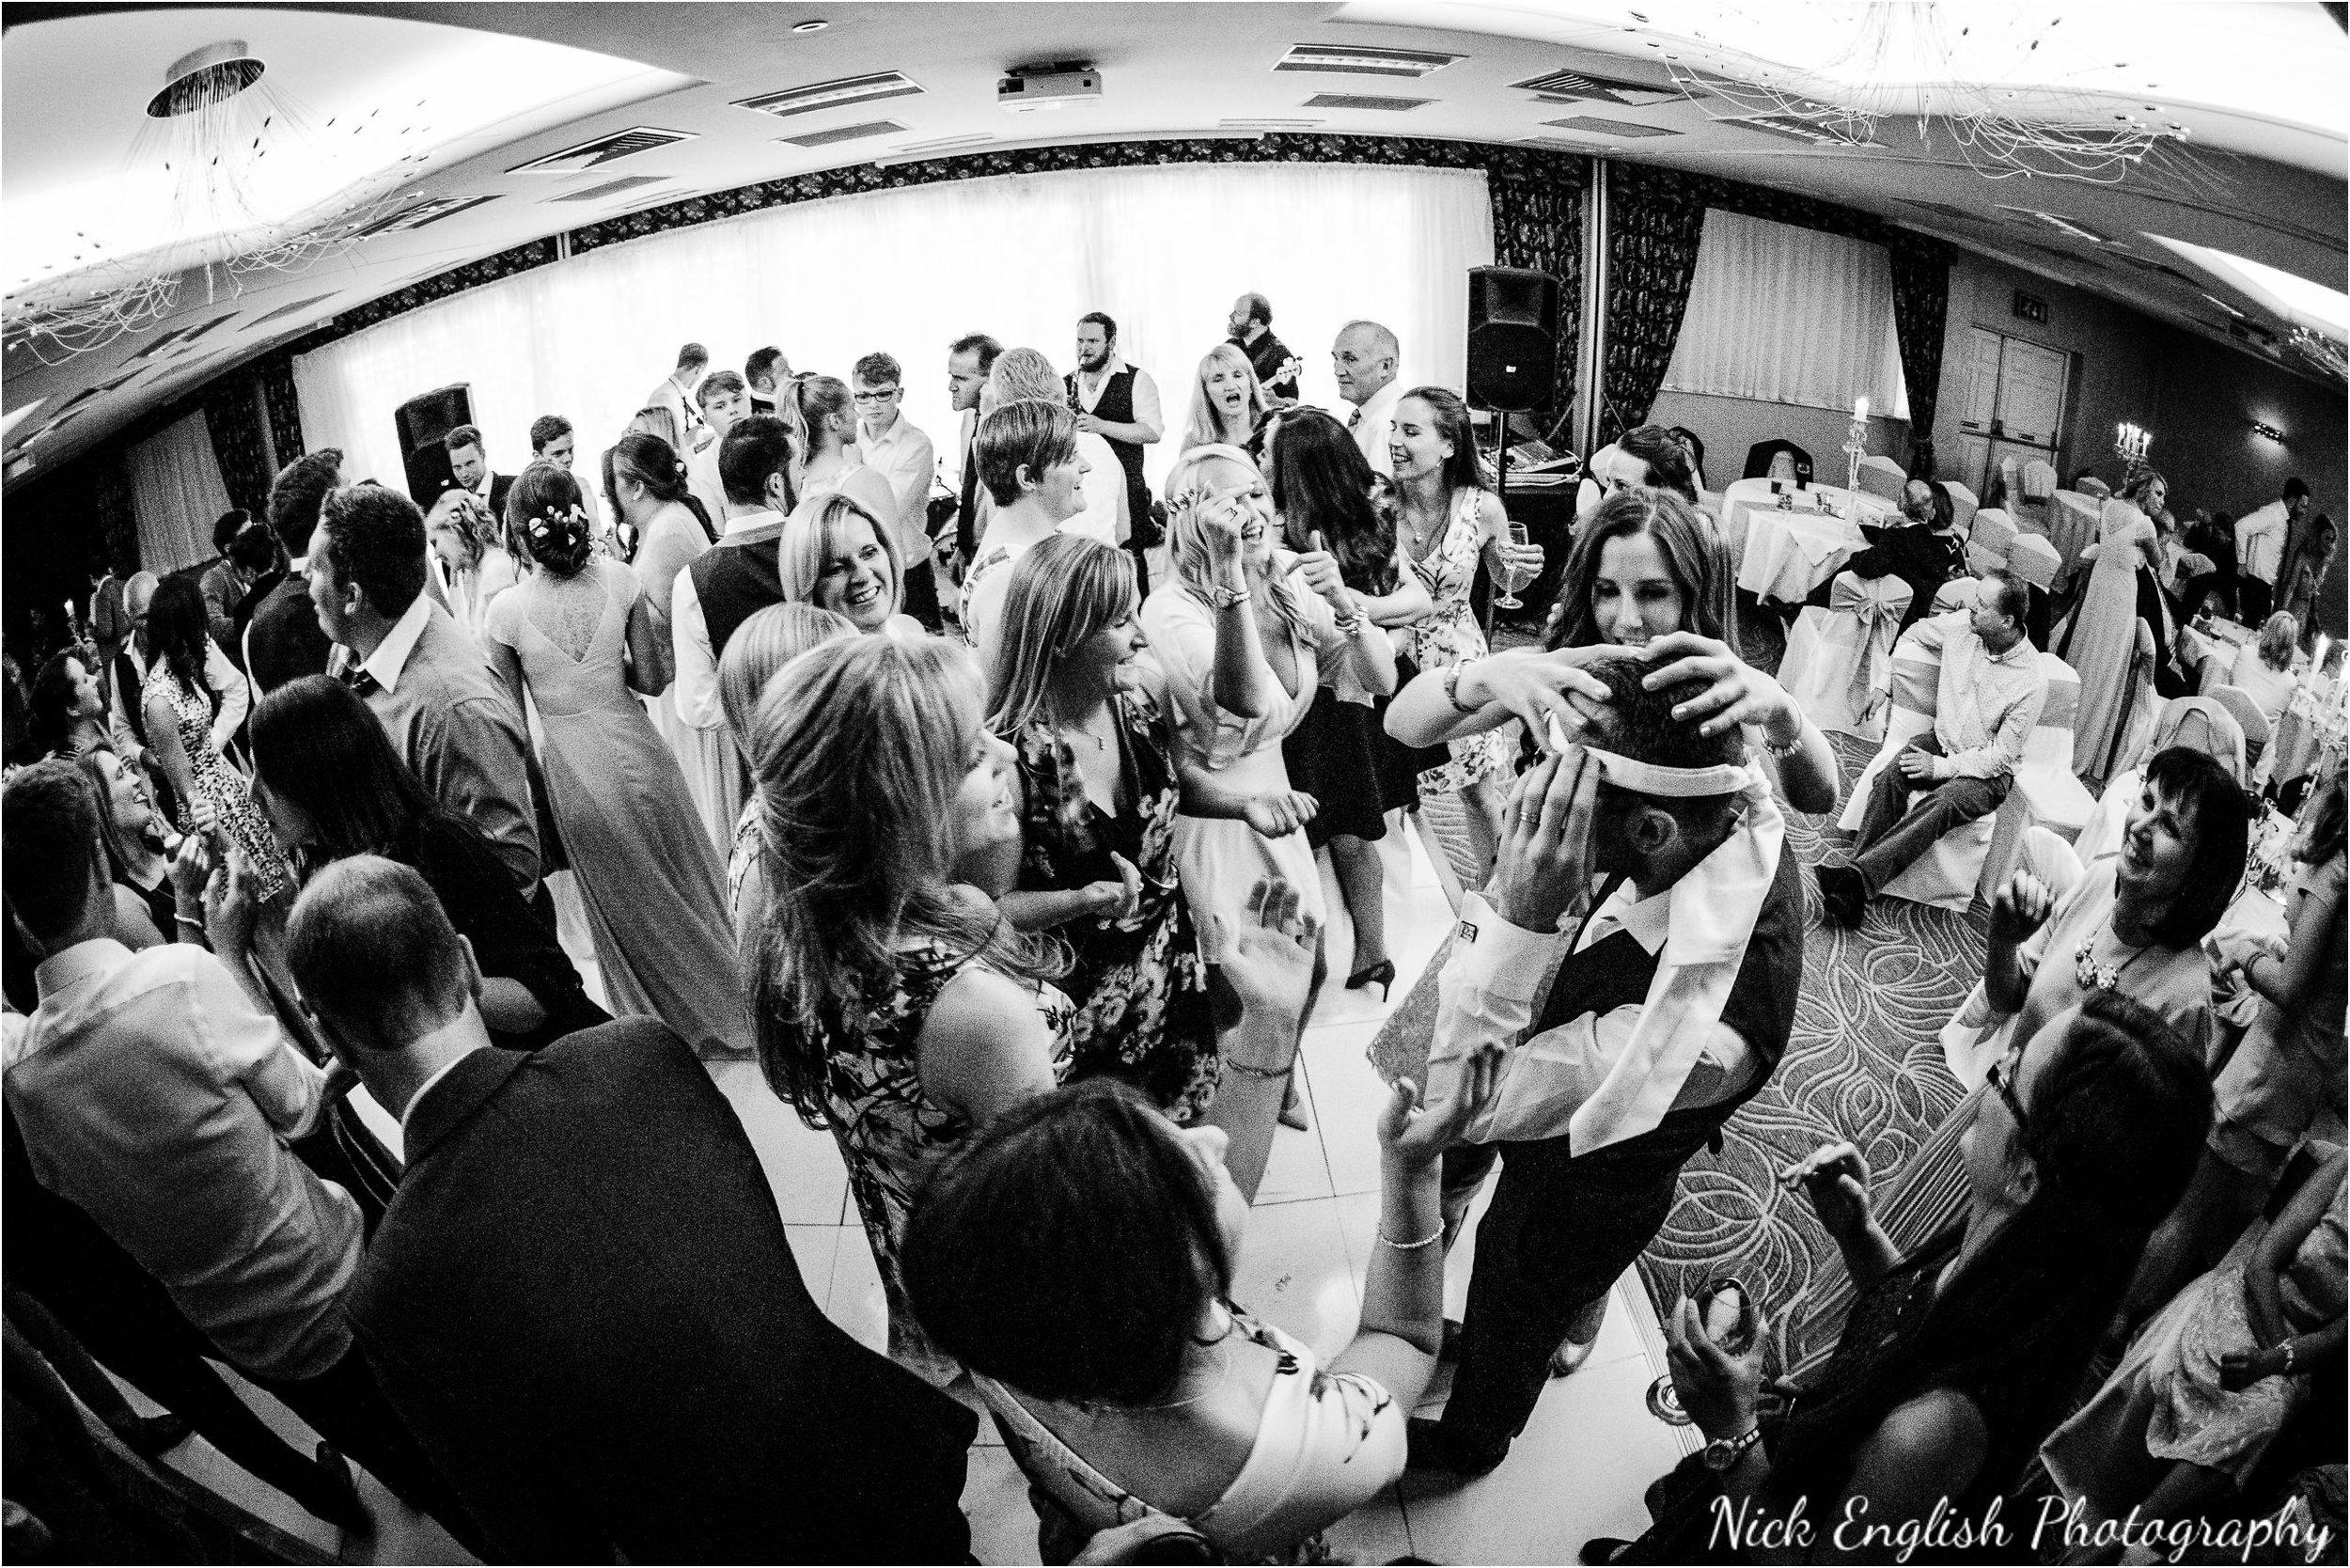 Emily David Wedding Photographs at Barton Grange Preston by Nick English Photography 233jpg.jpeg